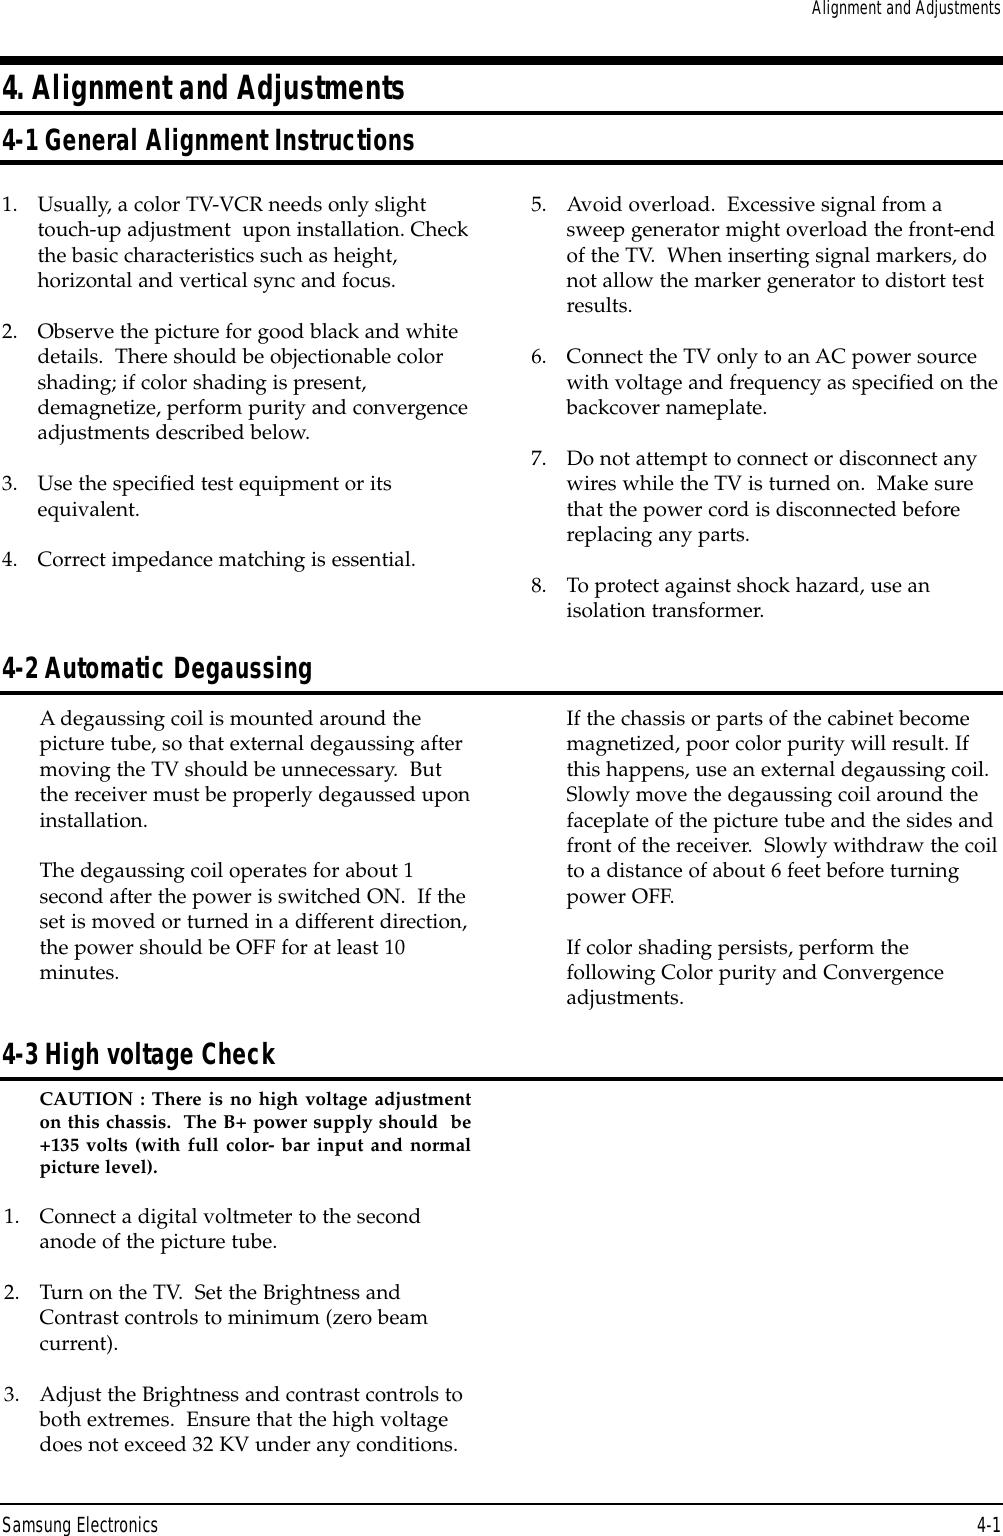 Samsung Cs29A5Wt8X Xsg Users Manual